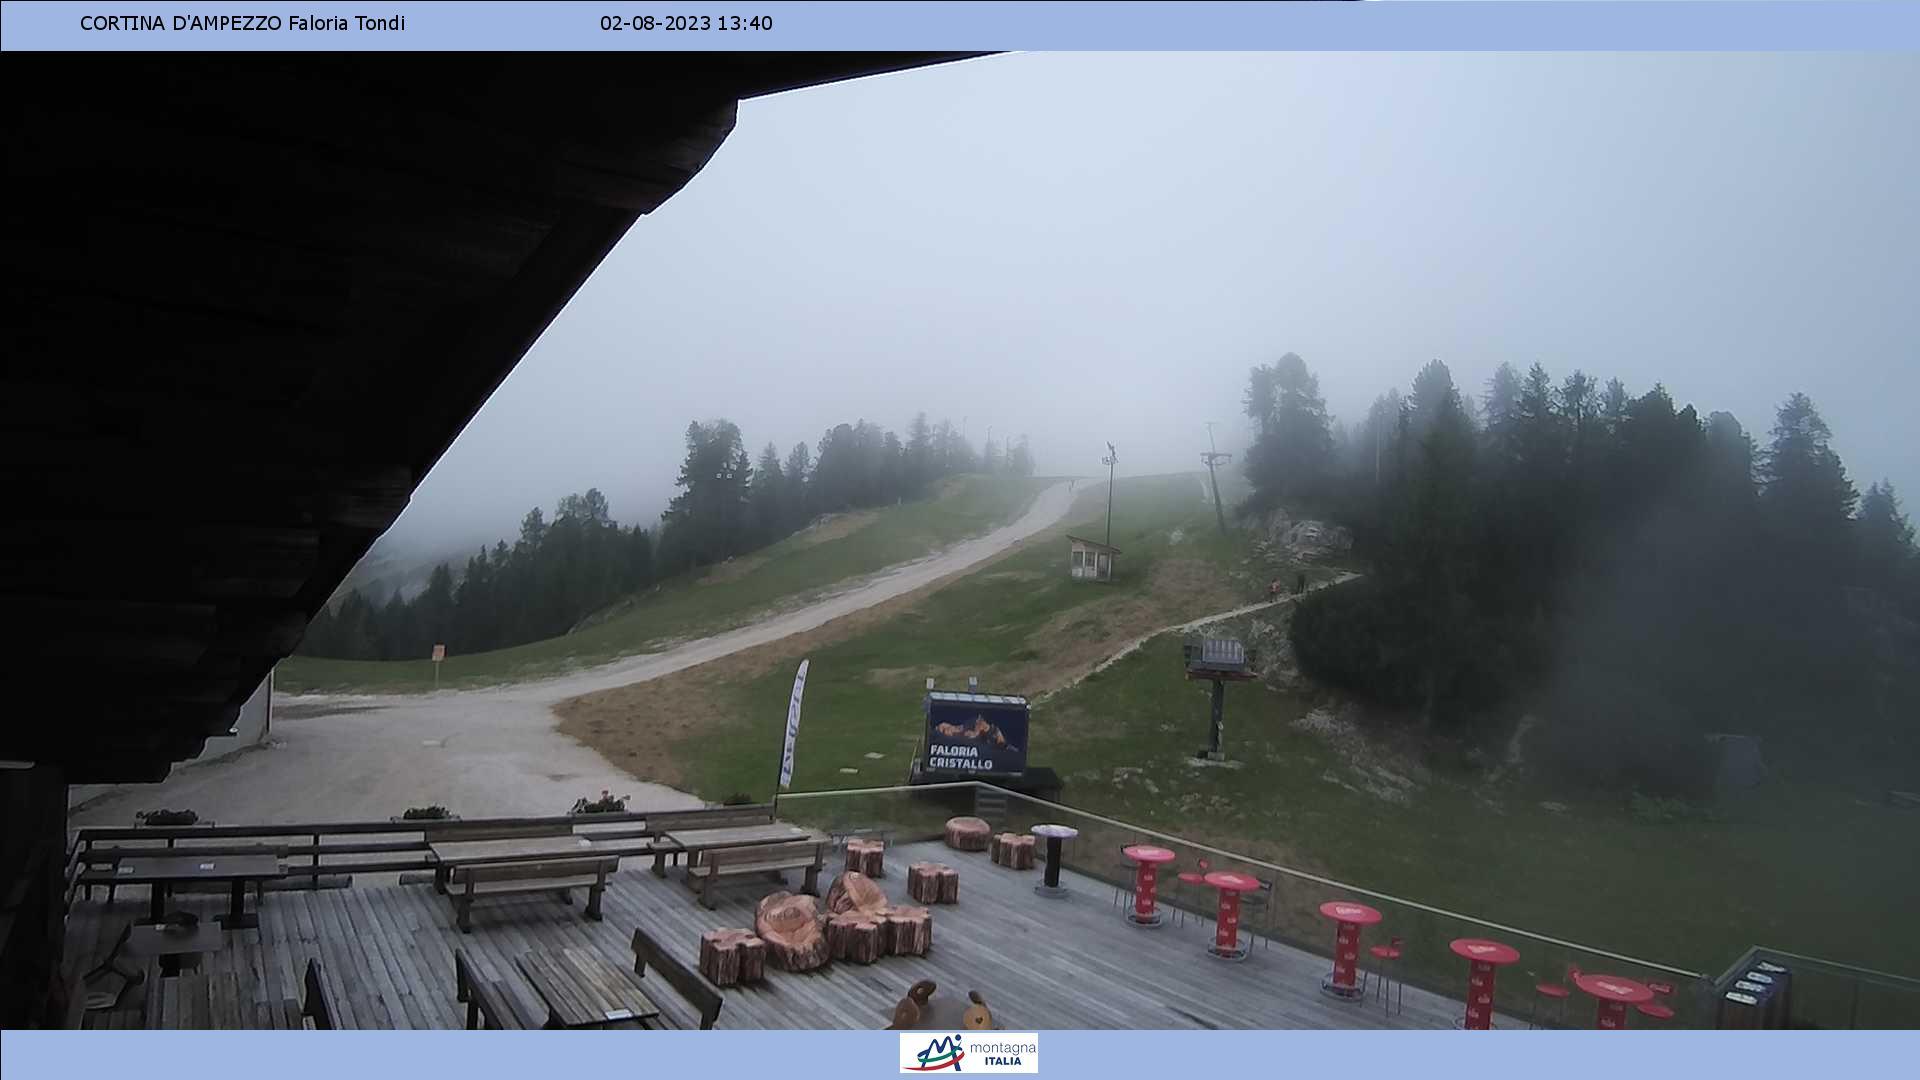 Webcam <br><span>Cortina d'Ampezzo</span>